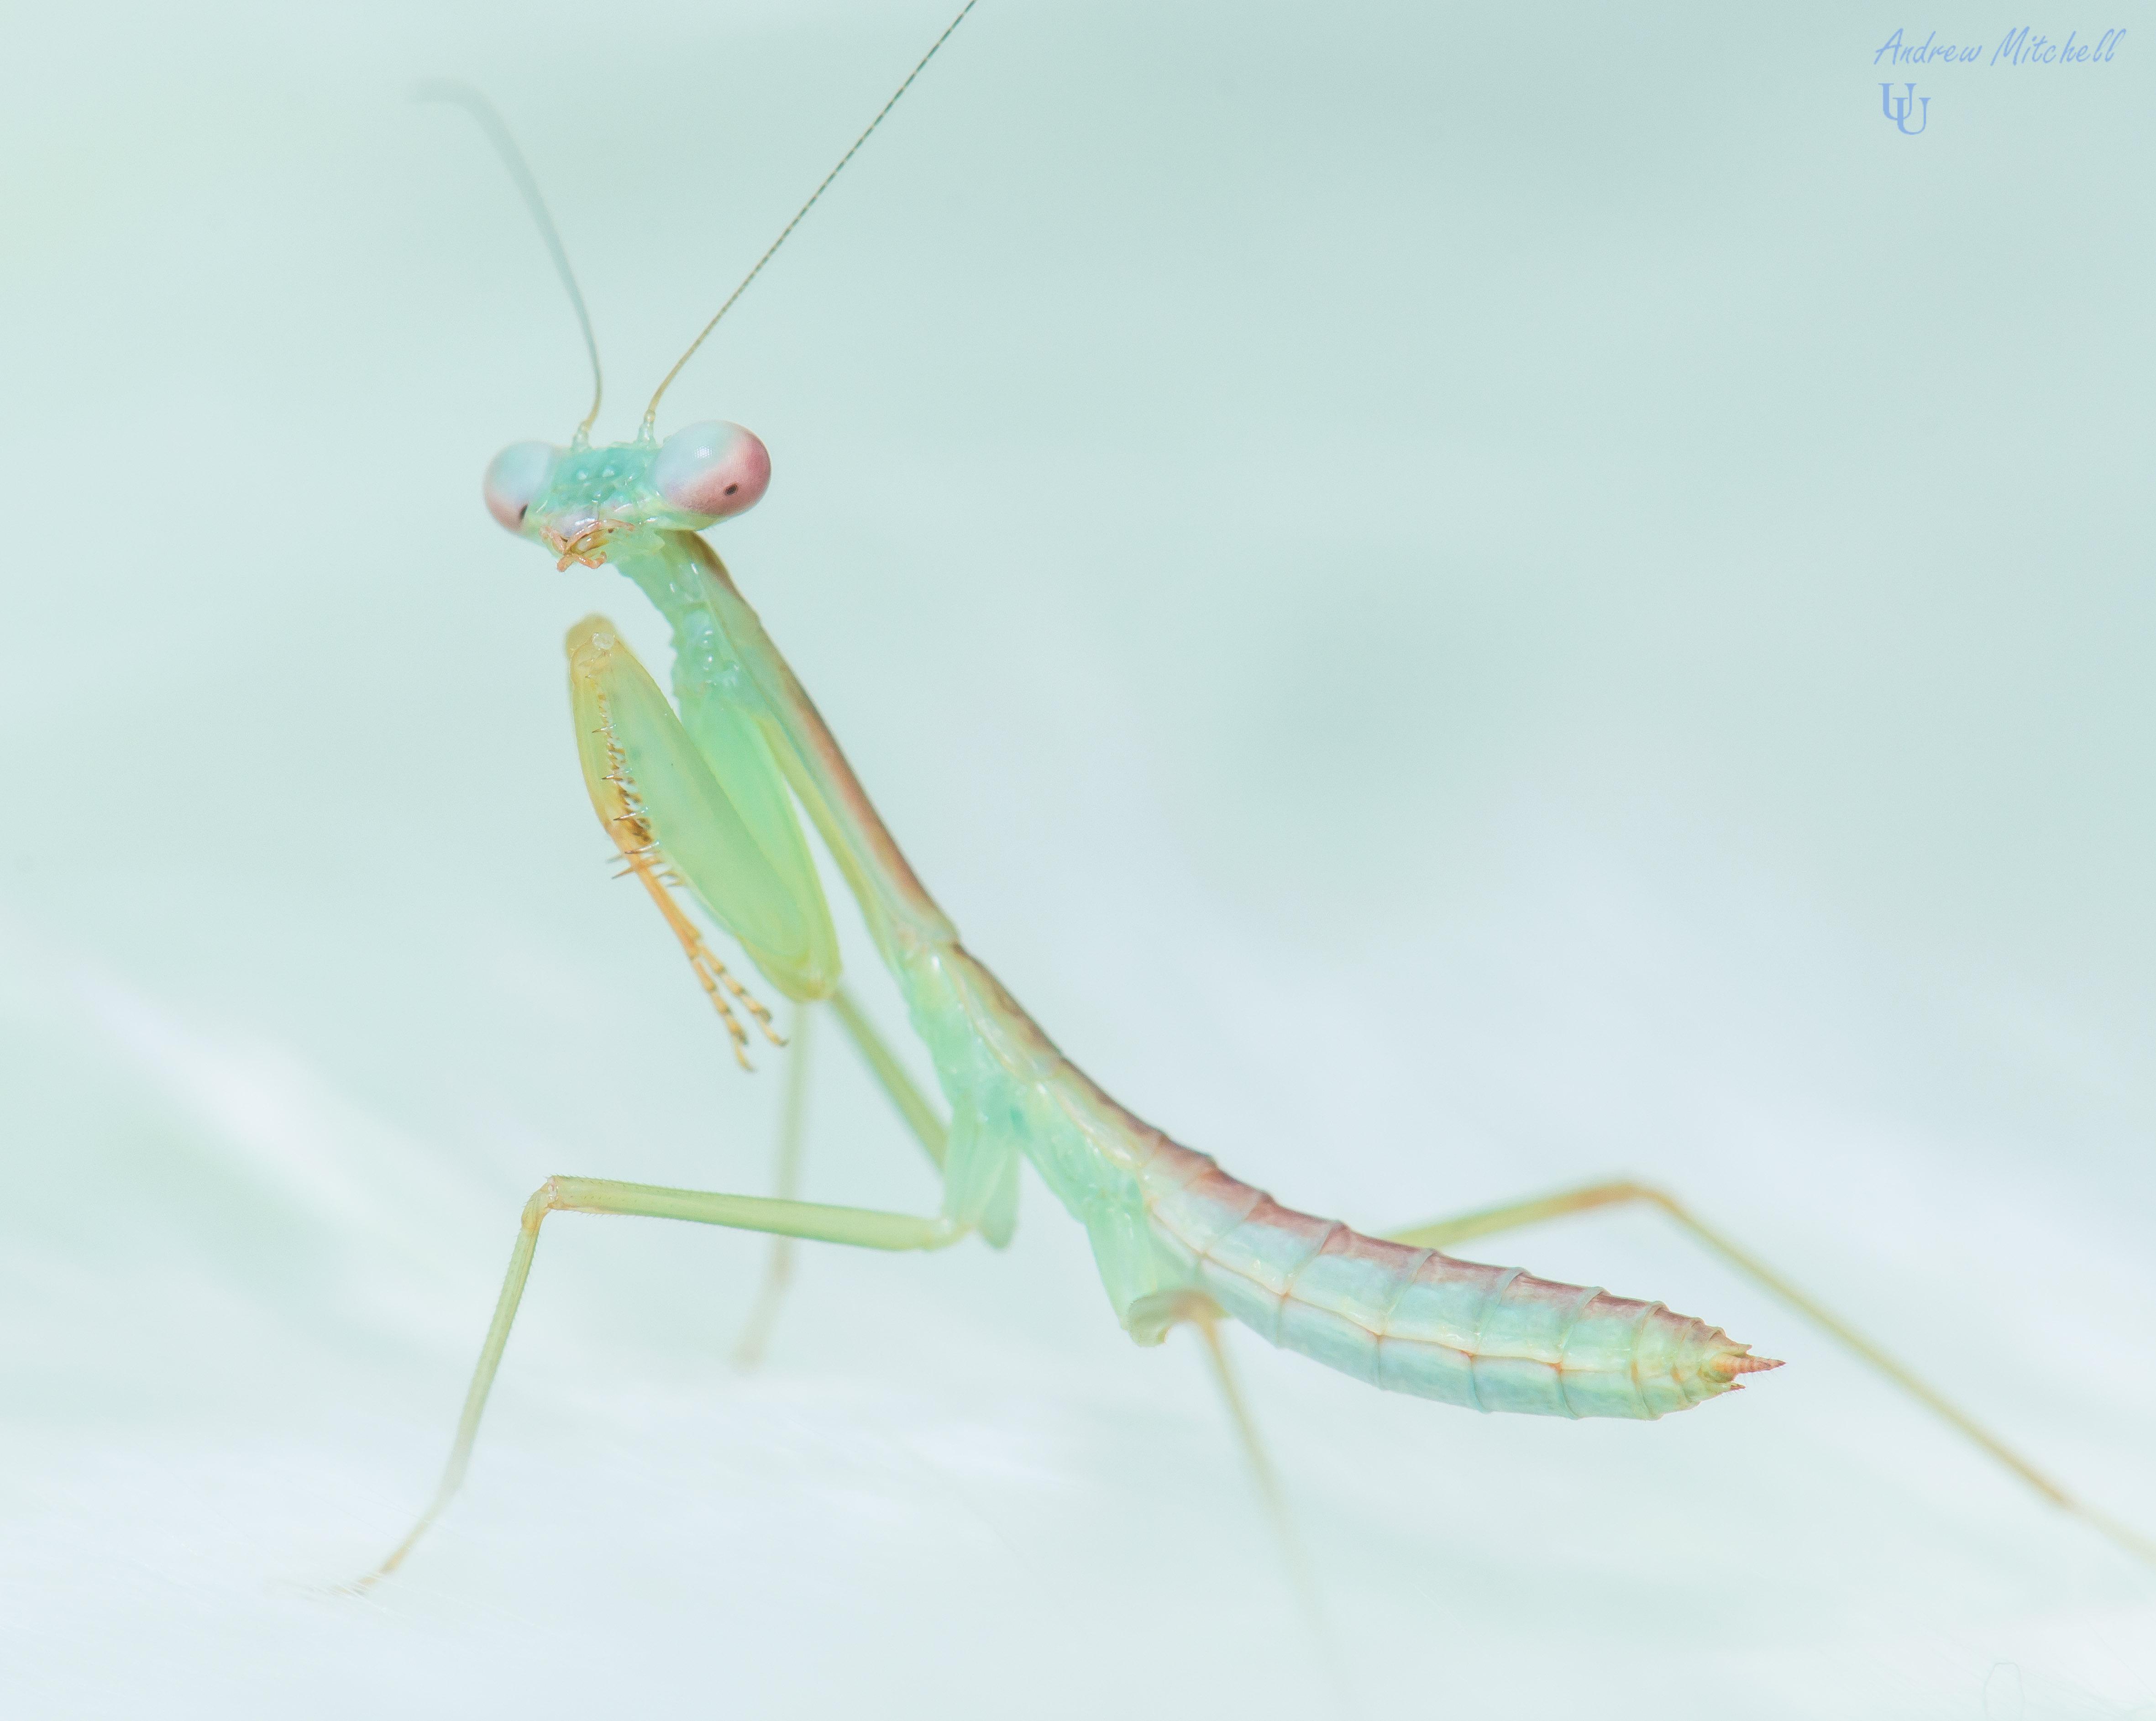 Hierodula Sp Blue Malaysian Blue Mantis 2nd Instar